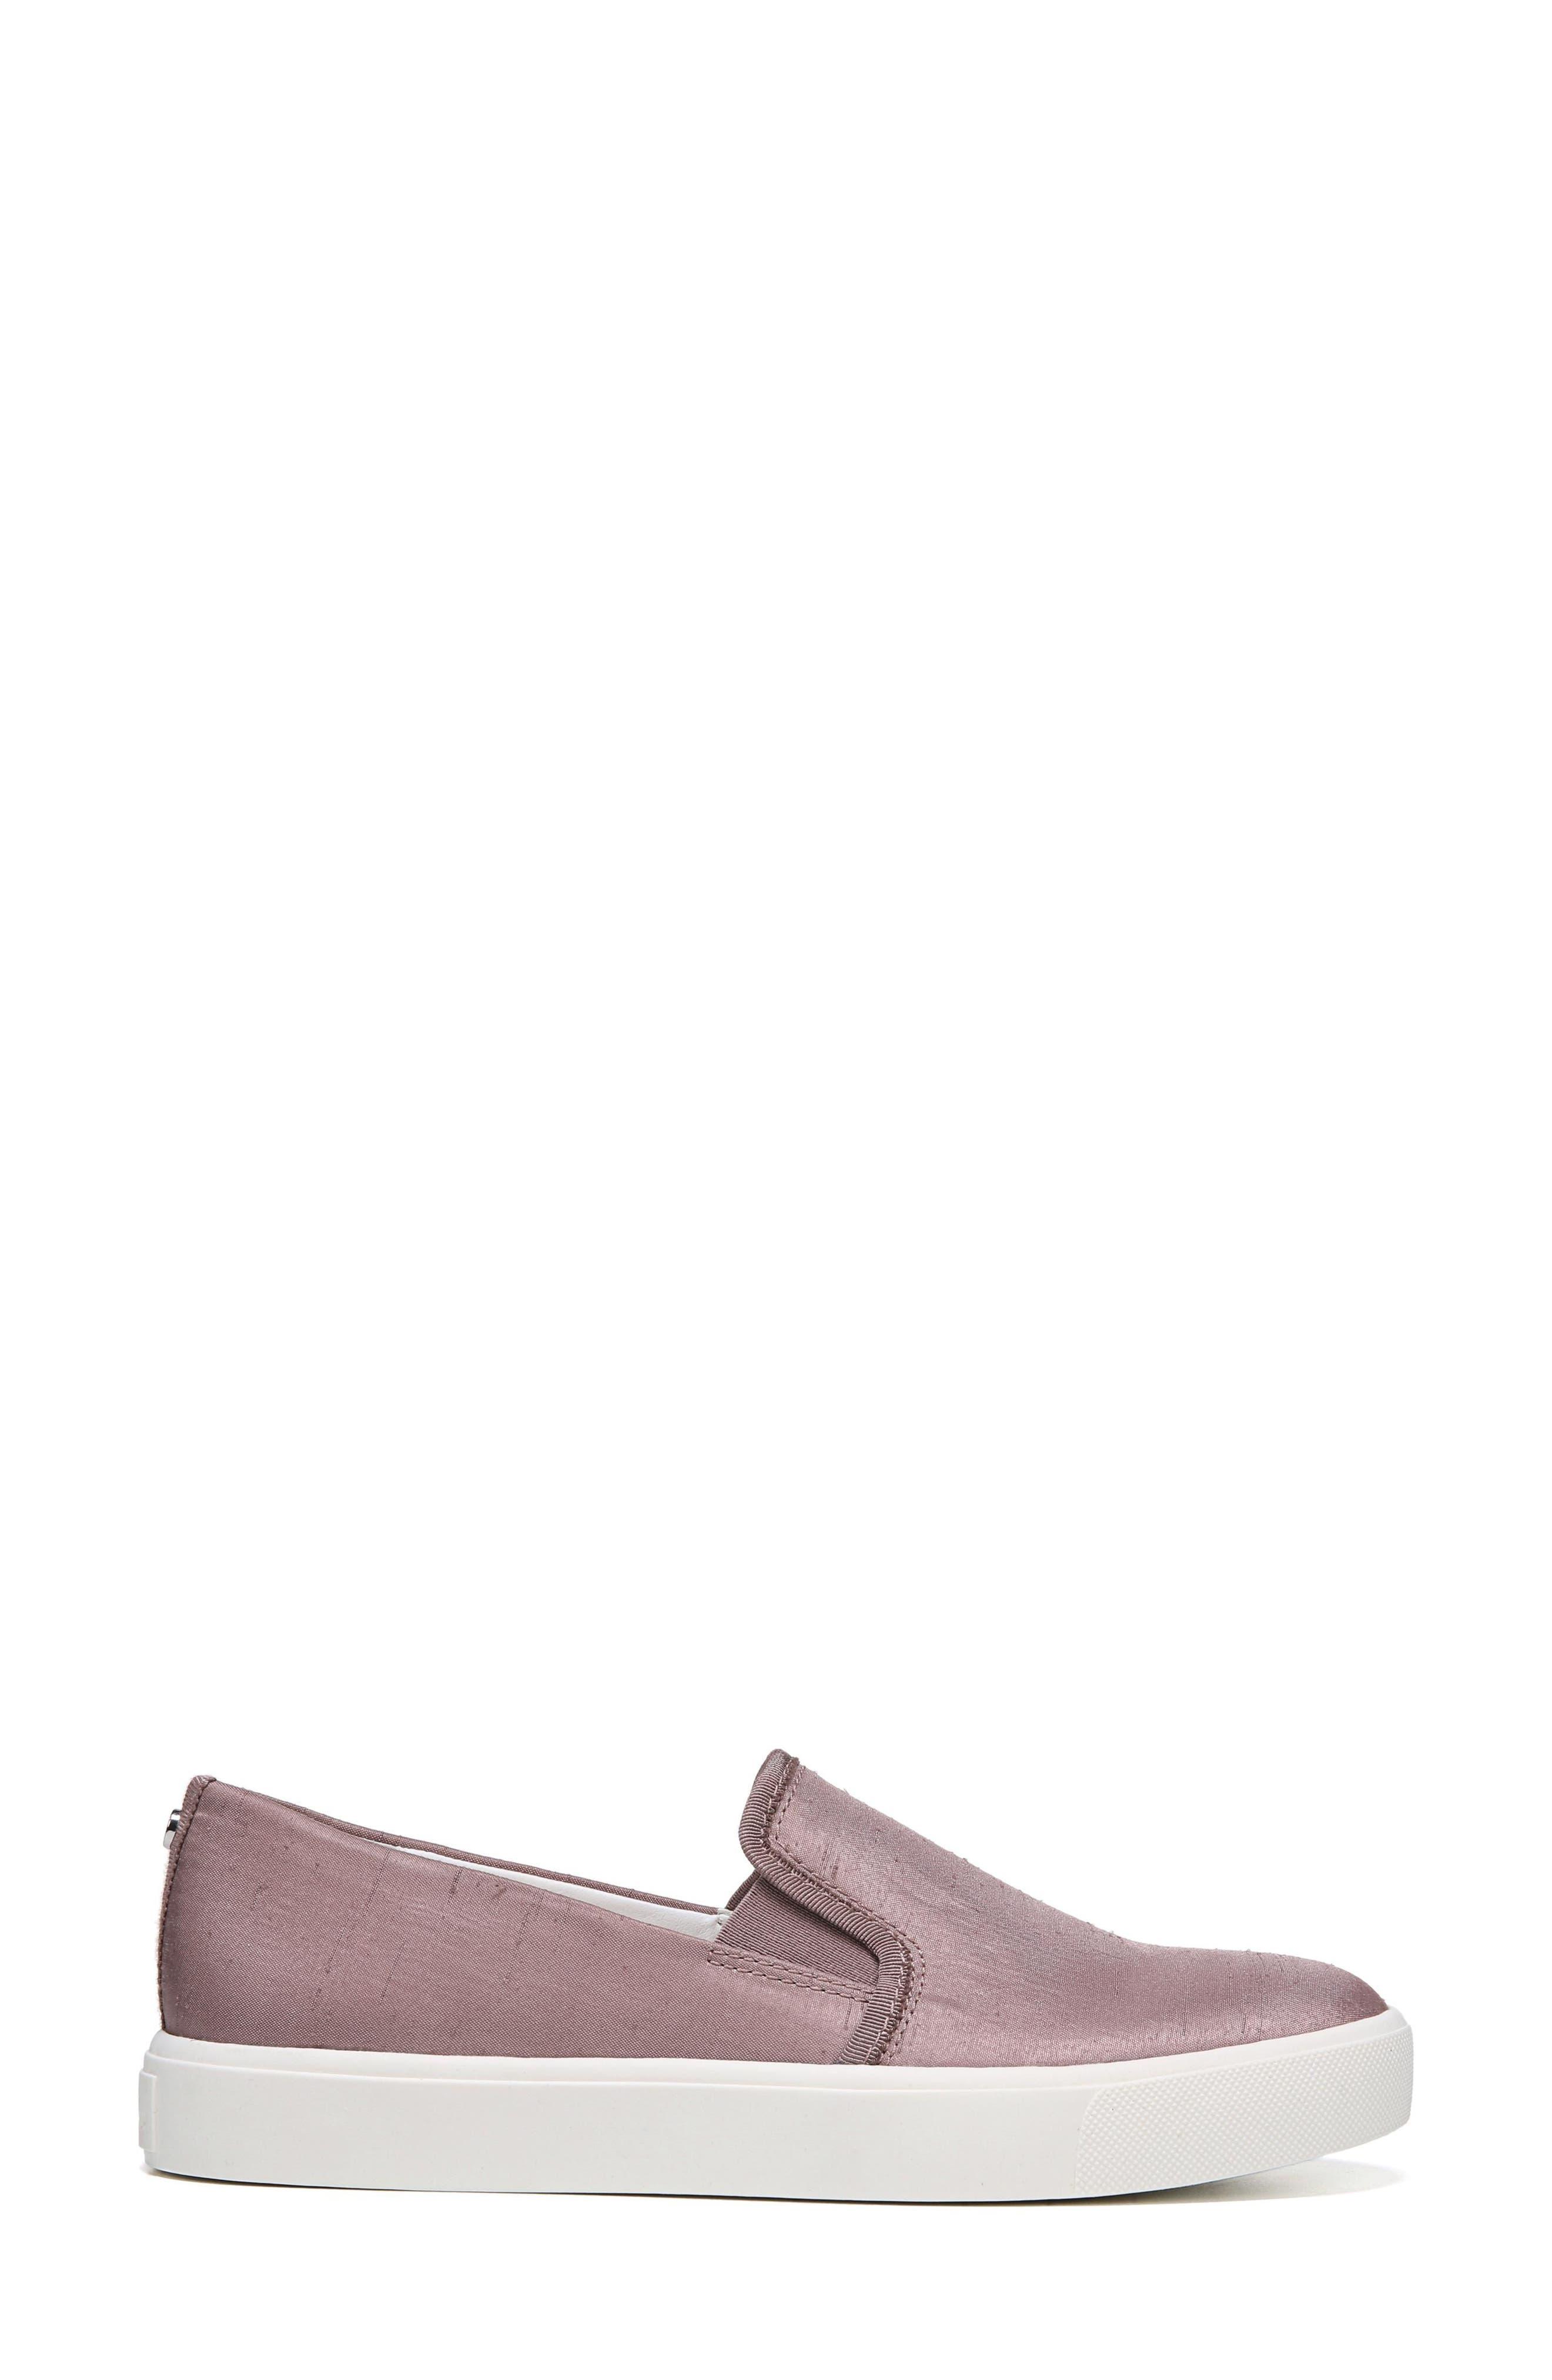 Elton Slip-On Sneaker,                             Alternate thumbnail 3, color,                             Pink Mauve Silk Fabric